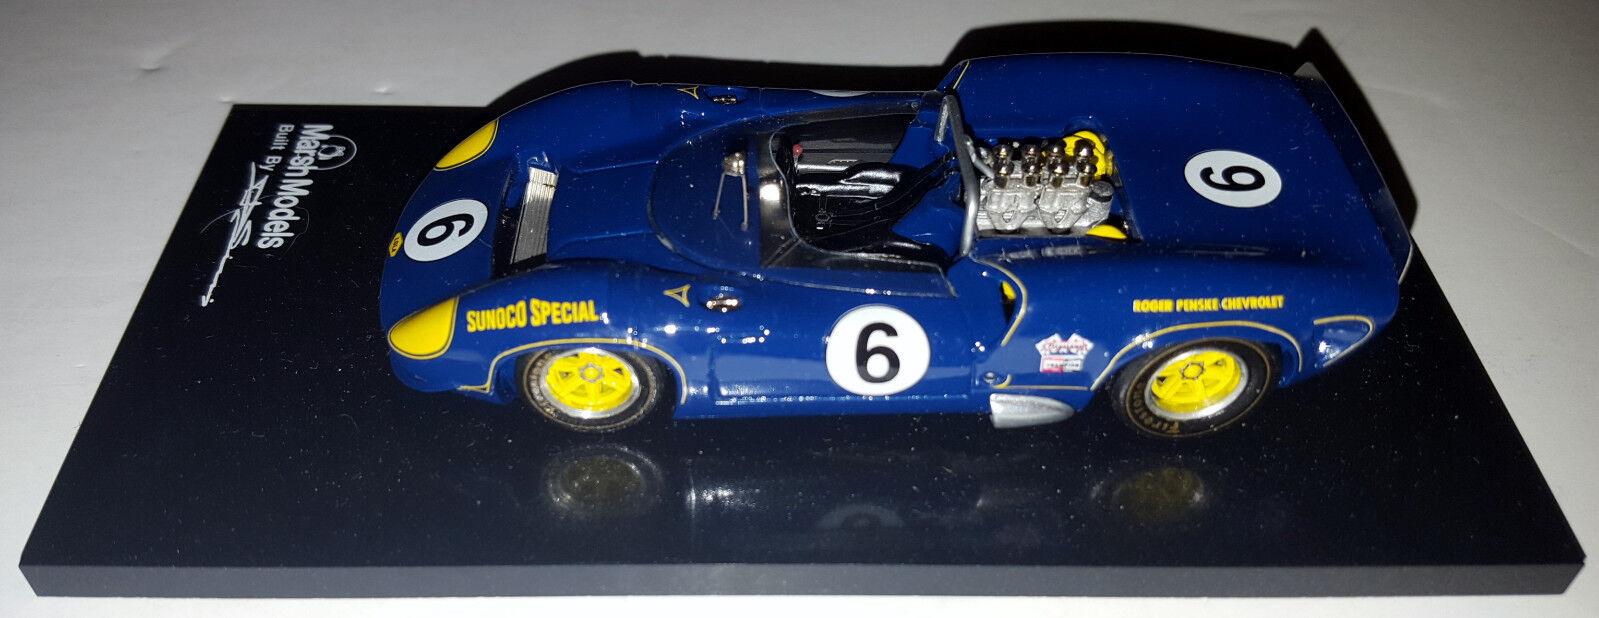 Marsh Models Built  MM24B 1 43 1966 Can Am Lola T70 Mk.II Sunoco Mark Donohue